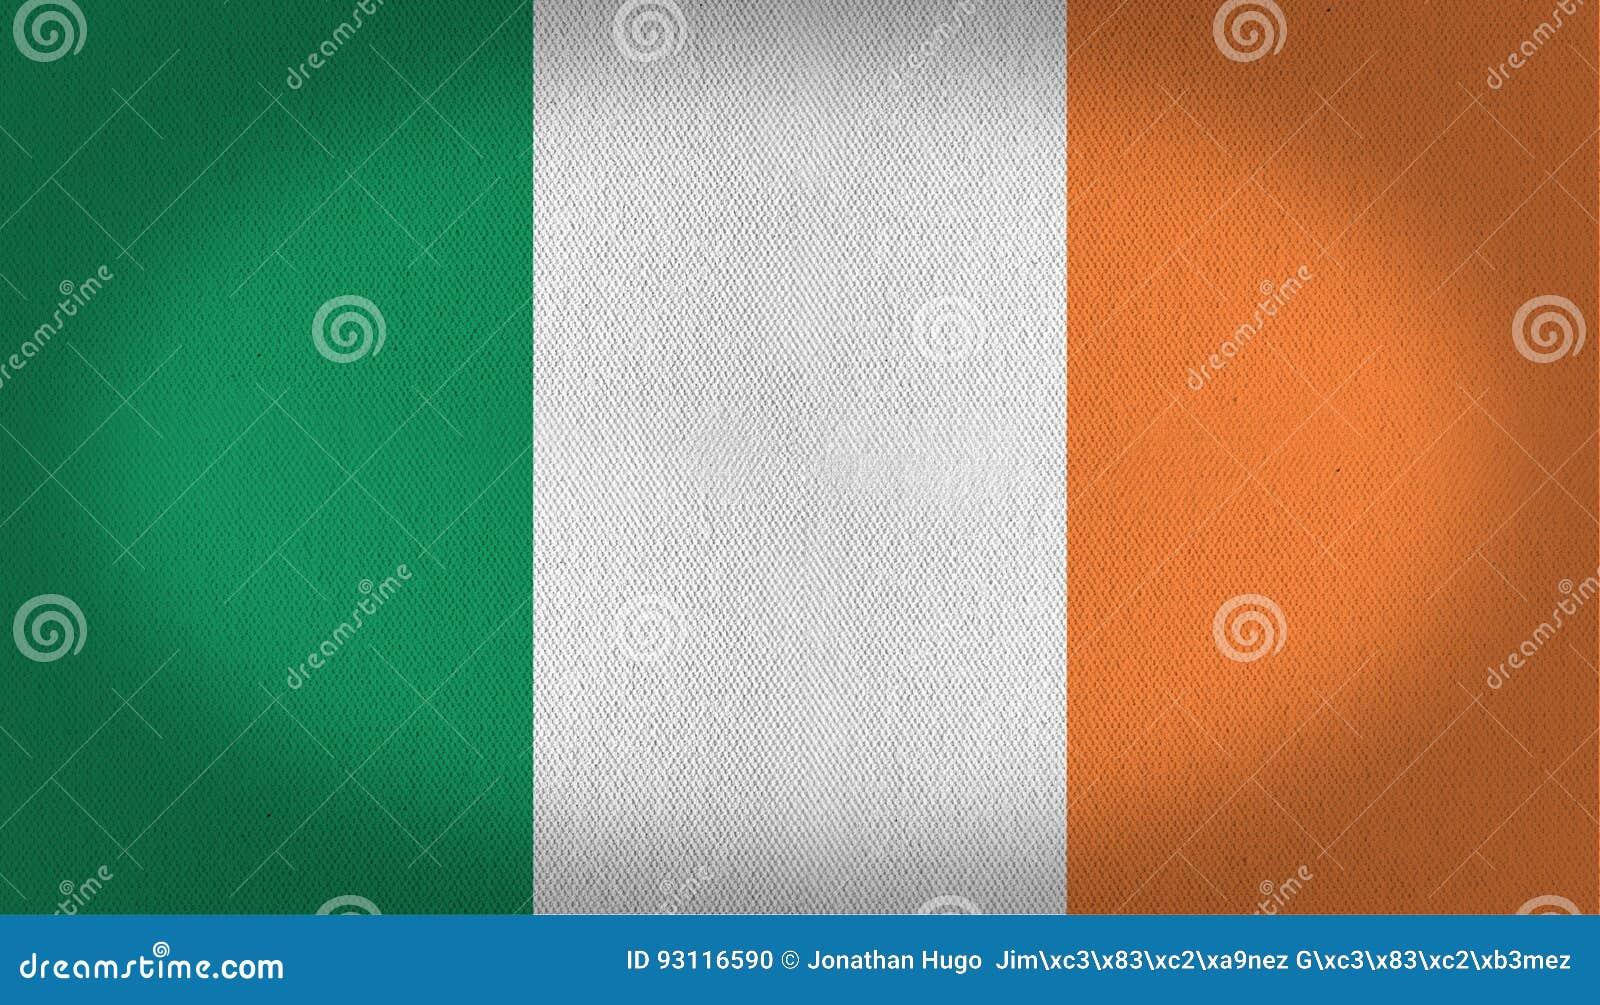 Ireland flag stock illustration  Illustration of fabric